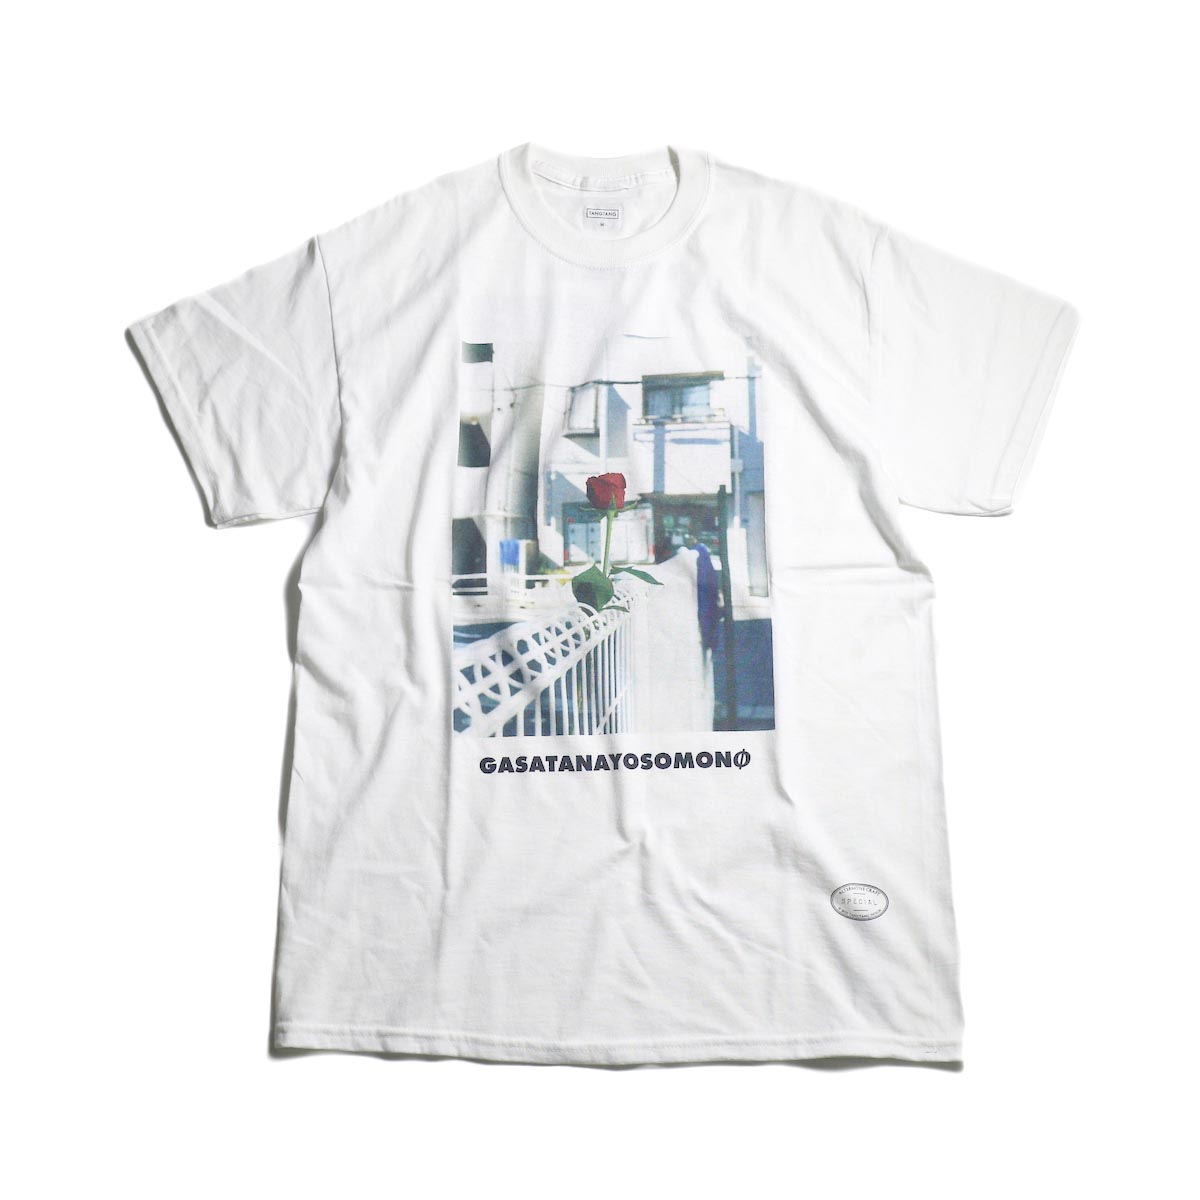 TANGTANG / GASATANA -GASATANAYOSOMONO (White)